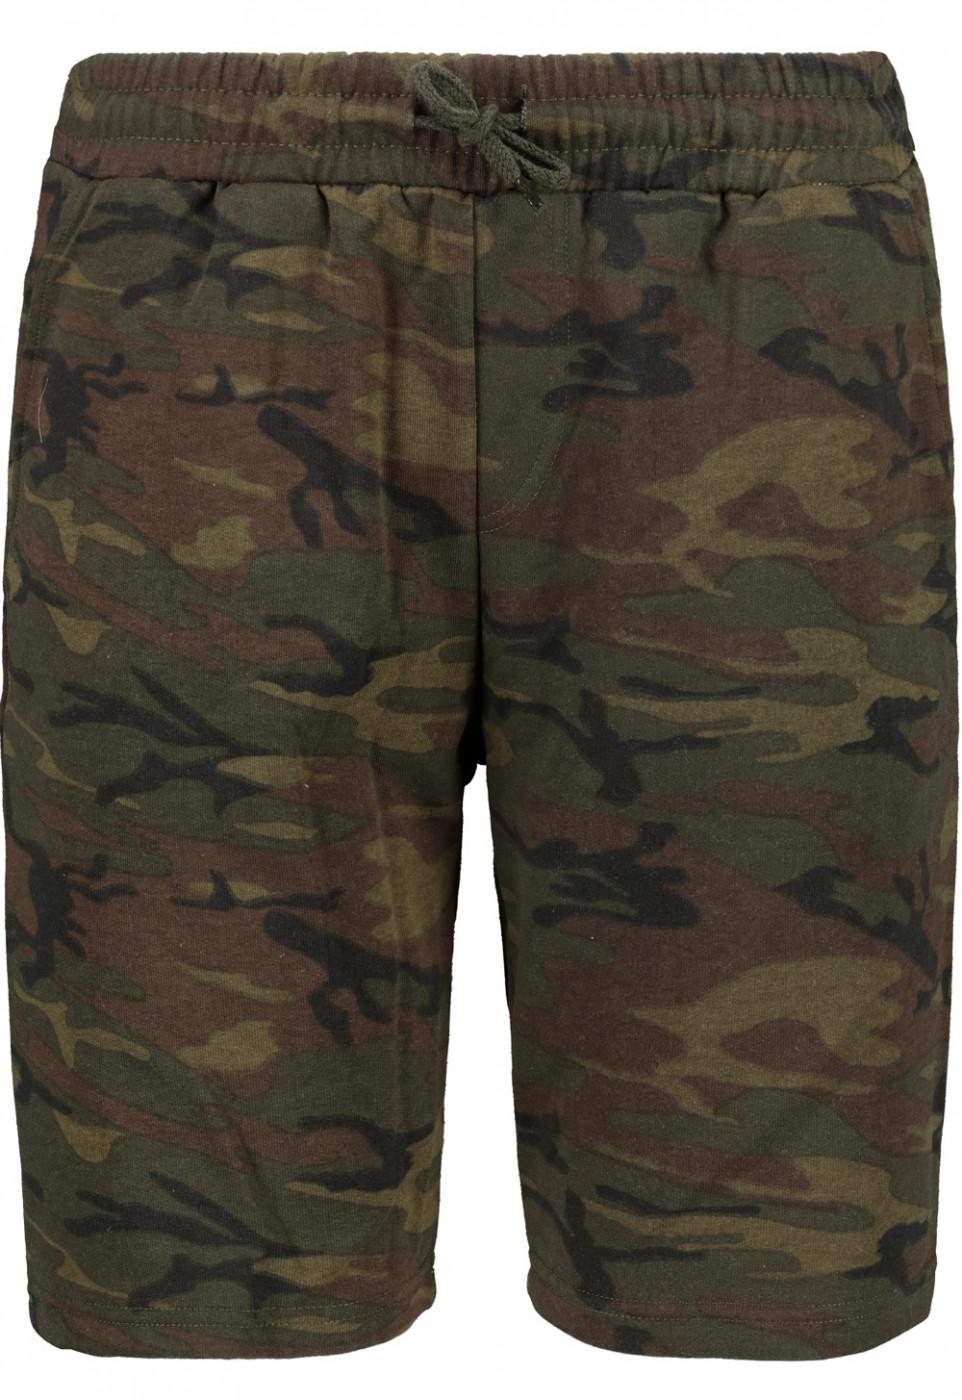 Men's shorts Trendyol Camo